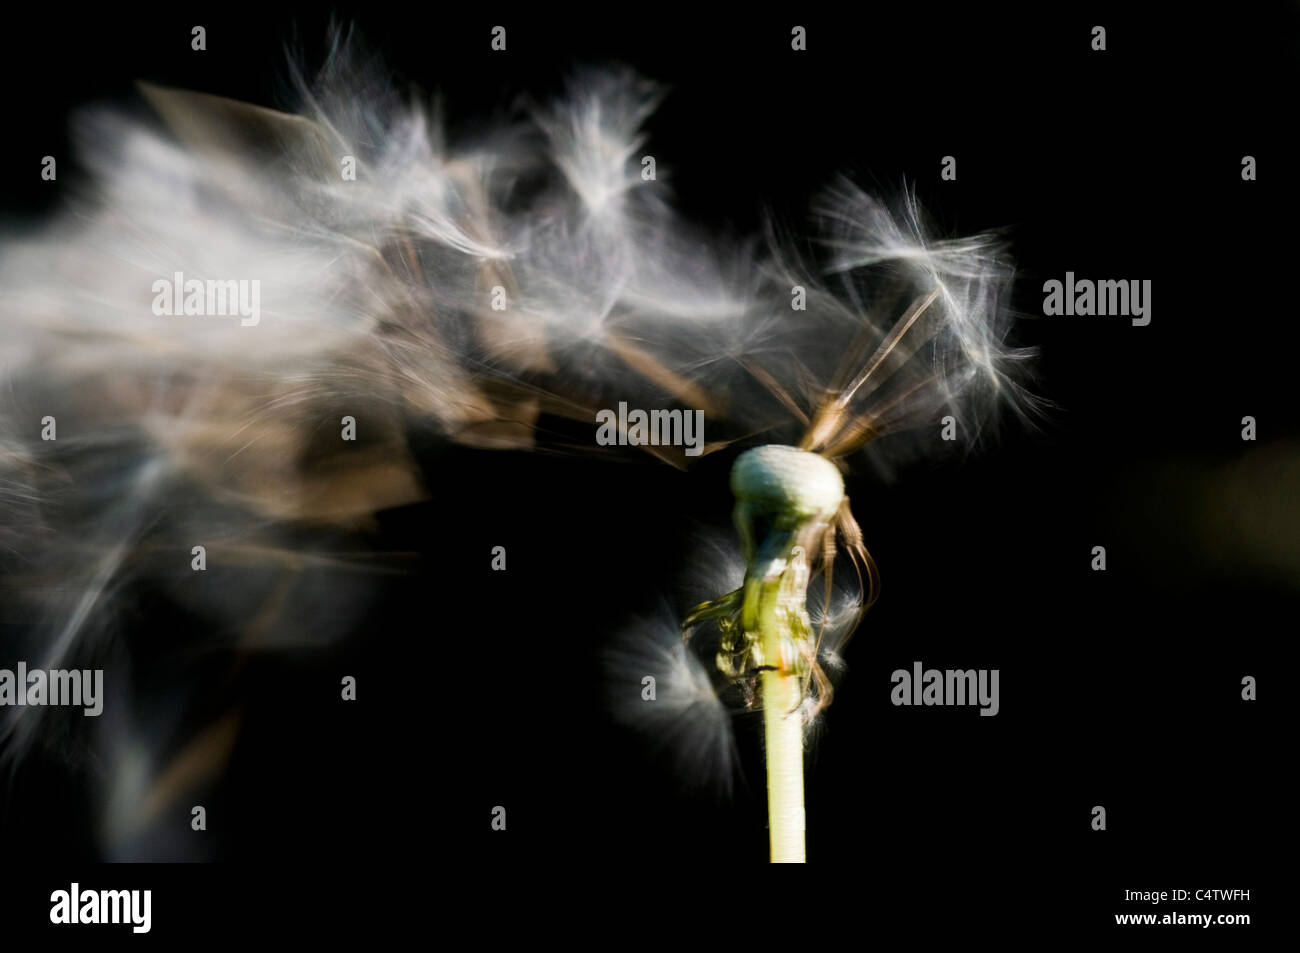 Wind blowing seeds off of dandelion seedhead (Taraxacum officinale) - Stock Image